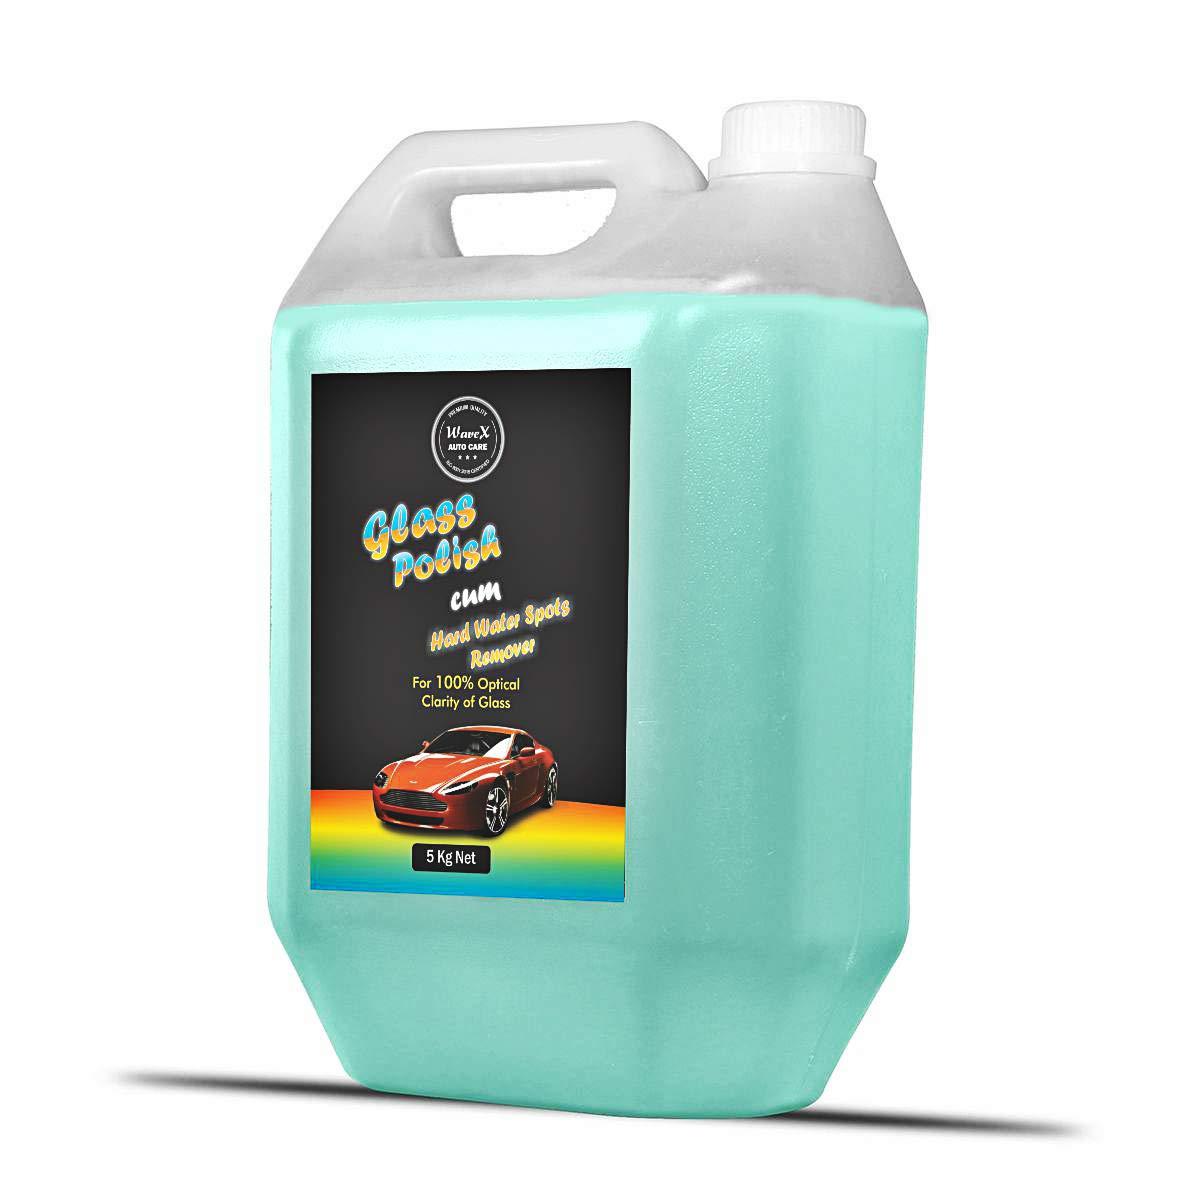 WaveX GP5K Glass Polish Cum Hard Water Spot Remover 5kg: Amazon in